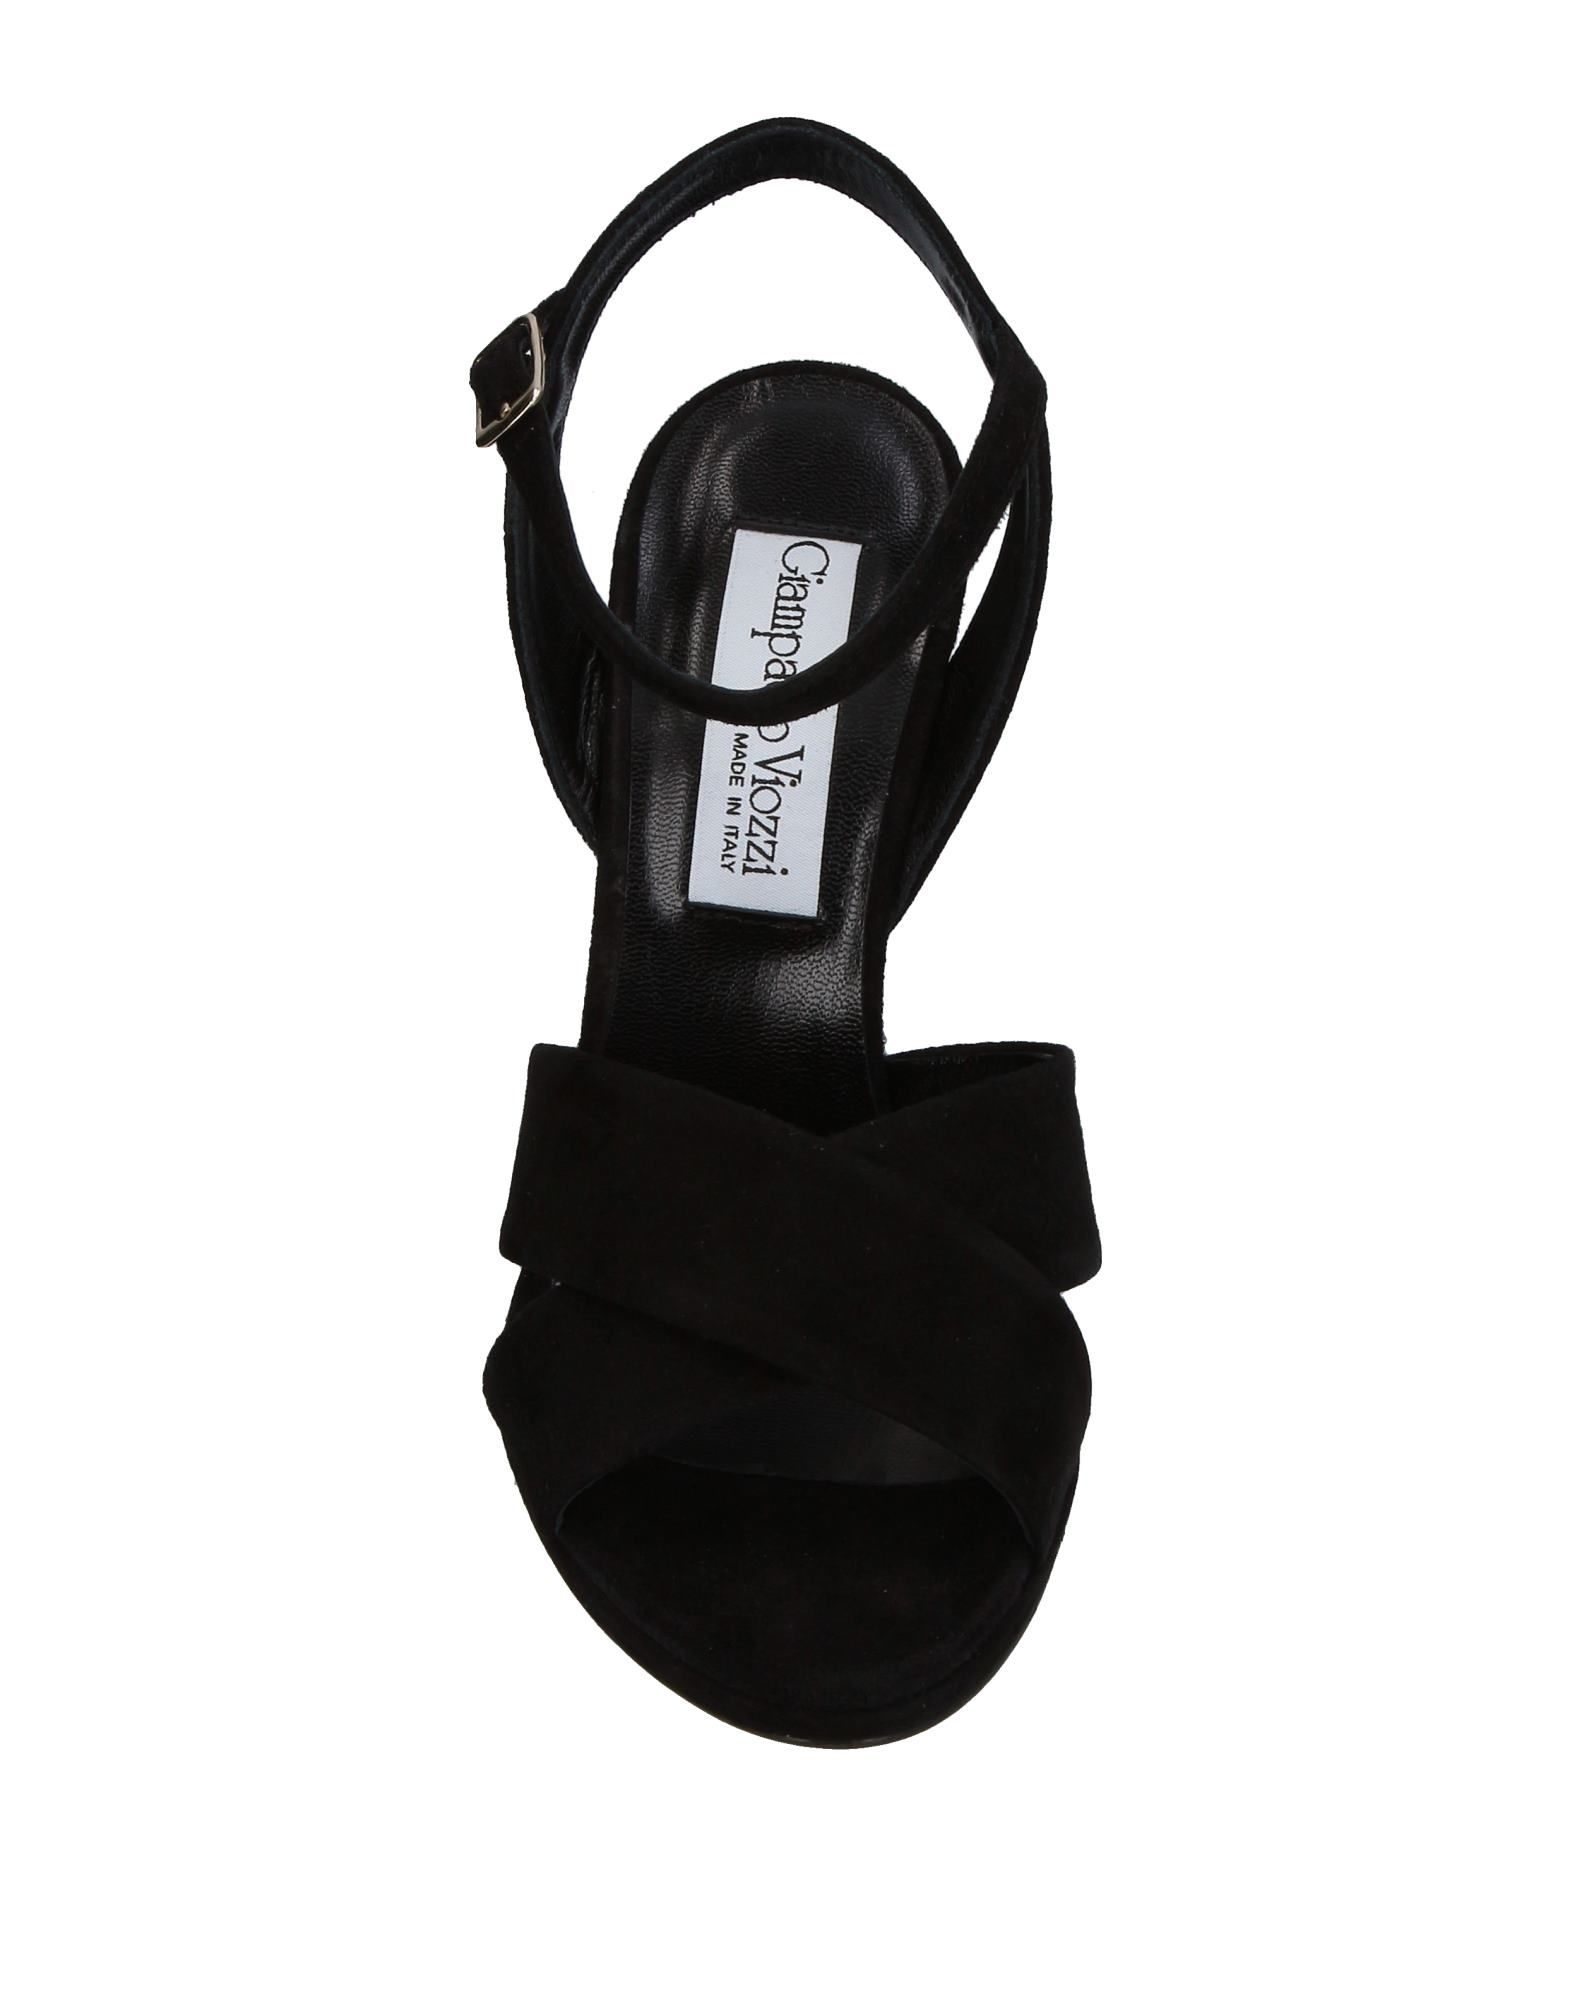 Sandales Giampaolo Viozzi Femme - Sandales Giampaolo Viozzi sur